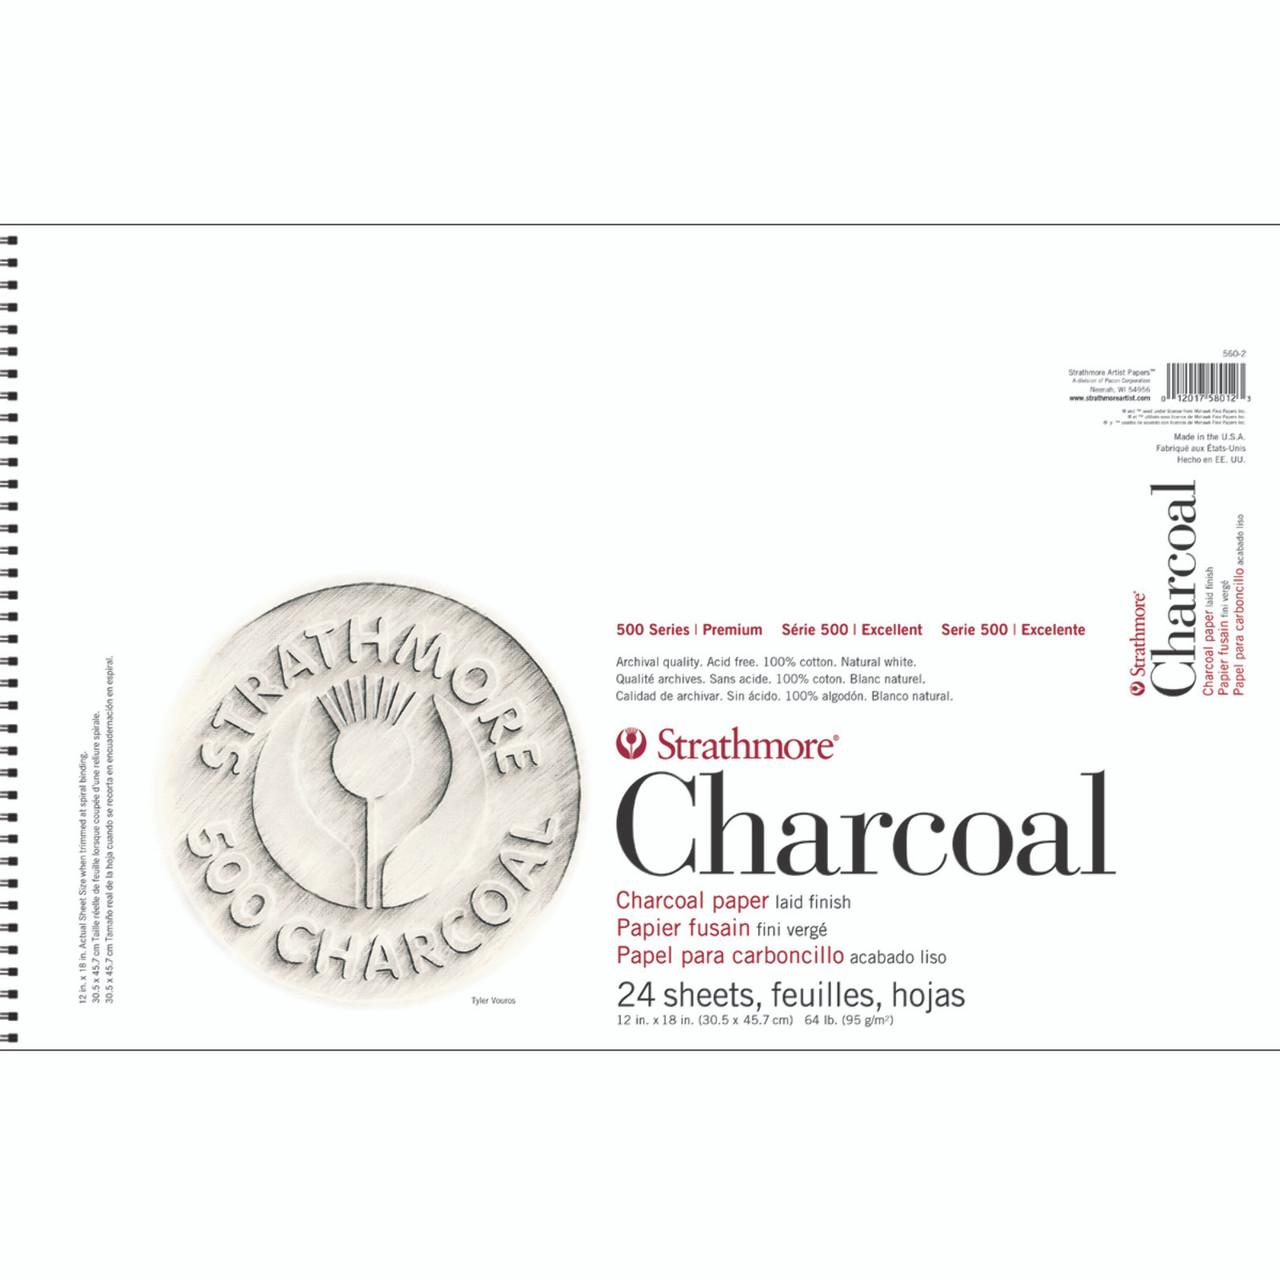 Charcoal Paper Pad Series 500 12 x 18